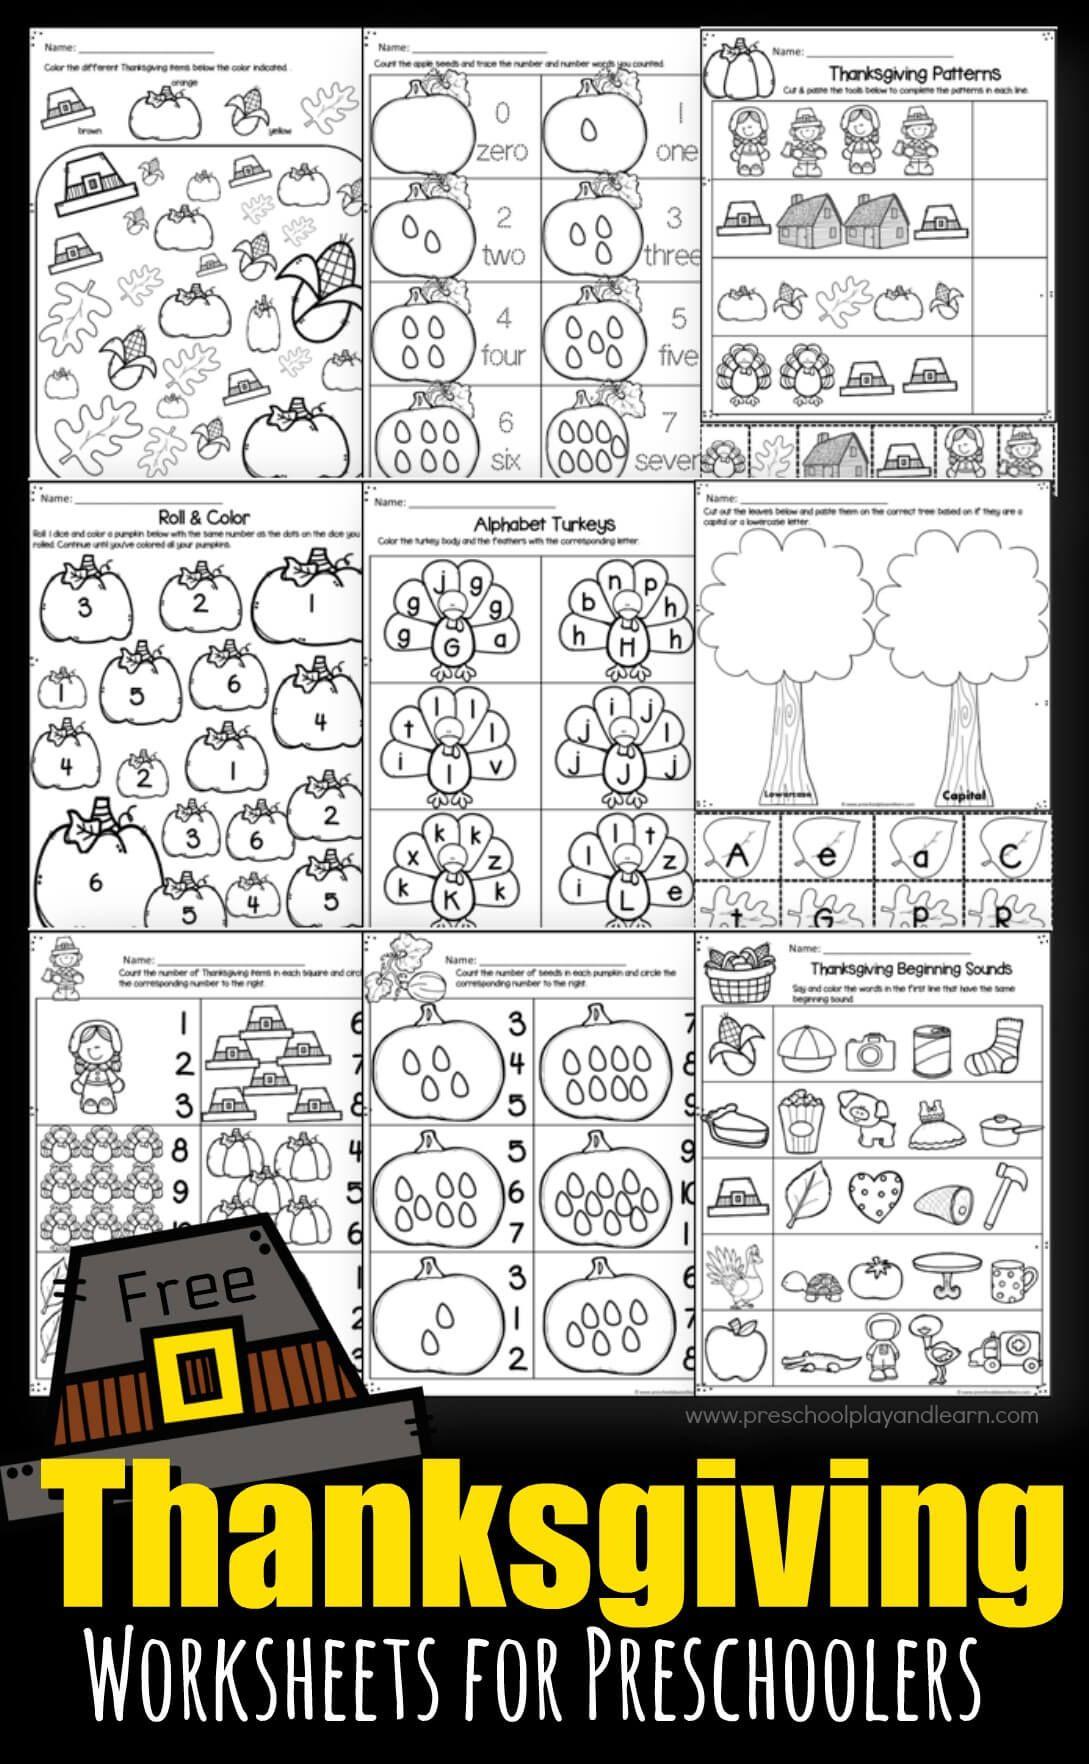 Predownload: Thanksgiving Worksheets For Preschoolers Thanksgiving Worksheets Thanksgiving Math Worksheets Preschool Worksheets [ 1764 x 1089 Pixel ]